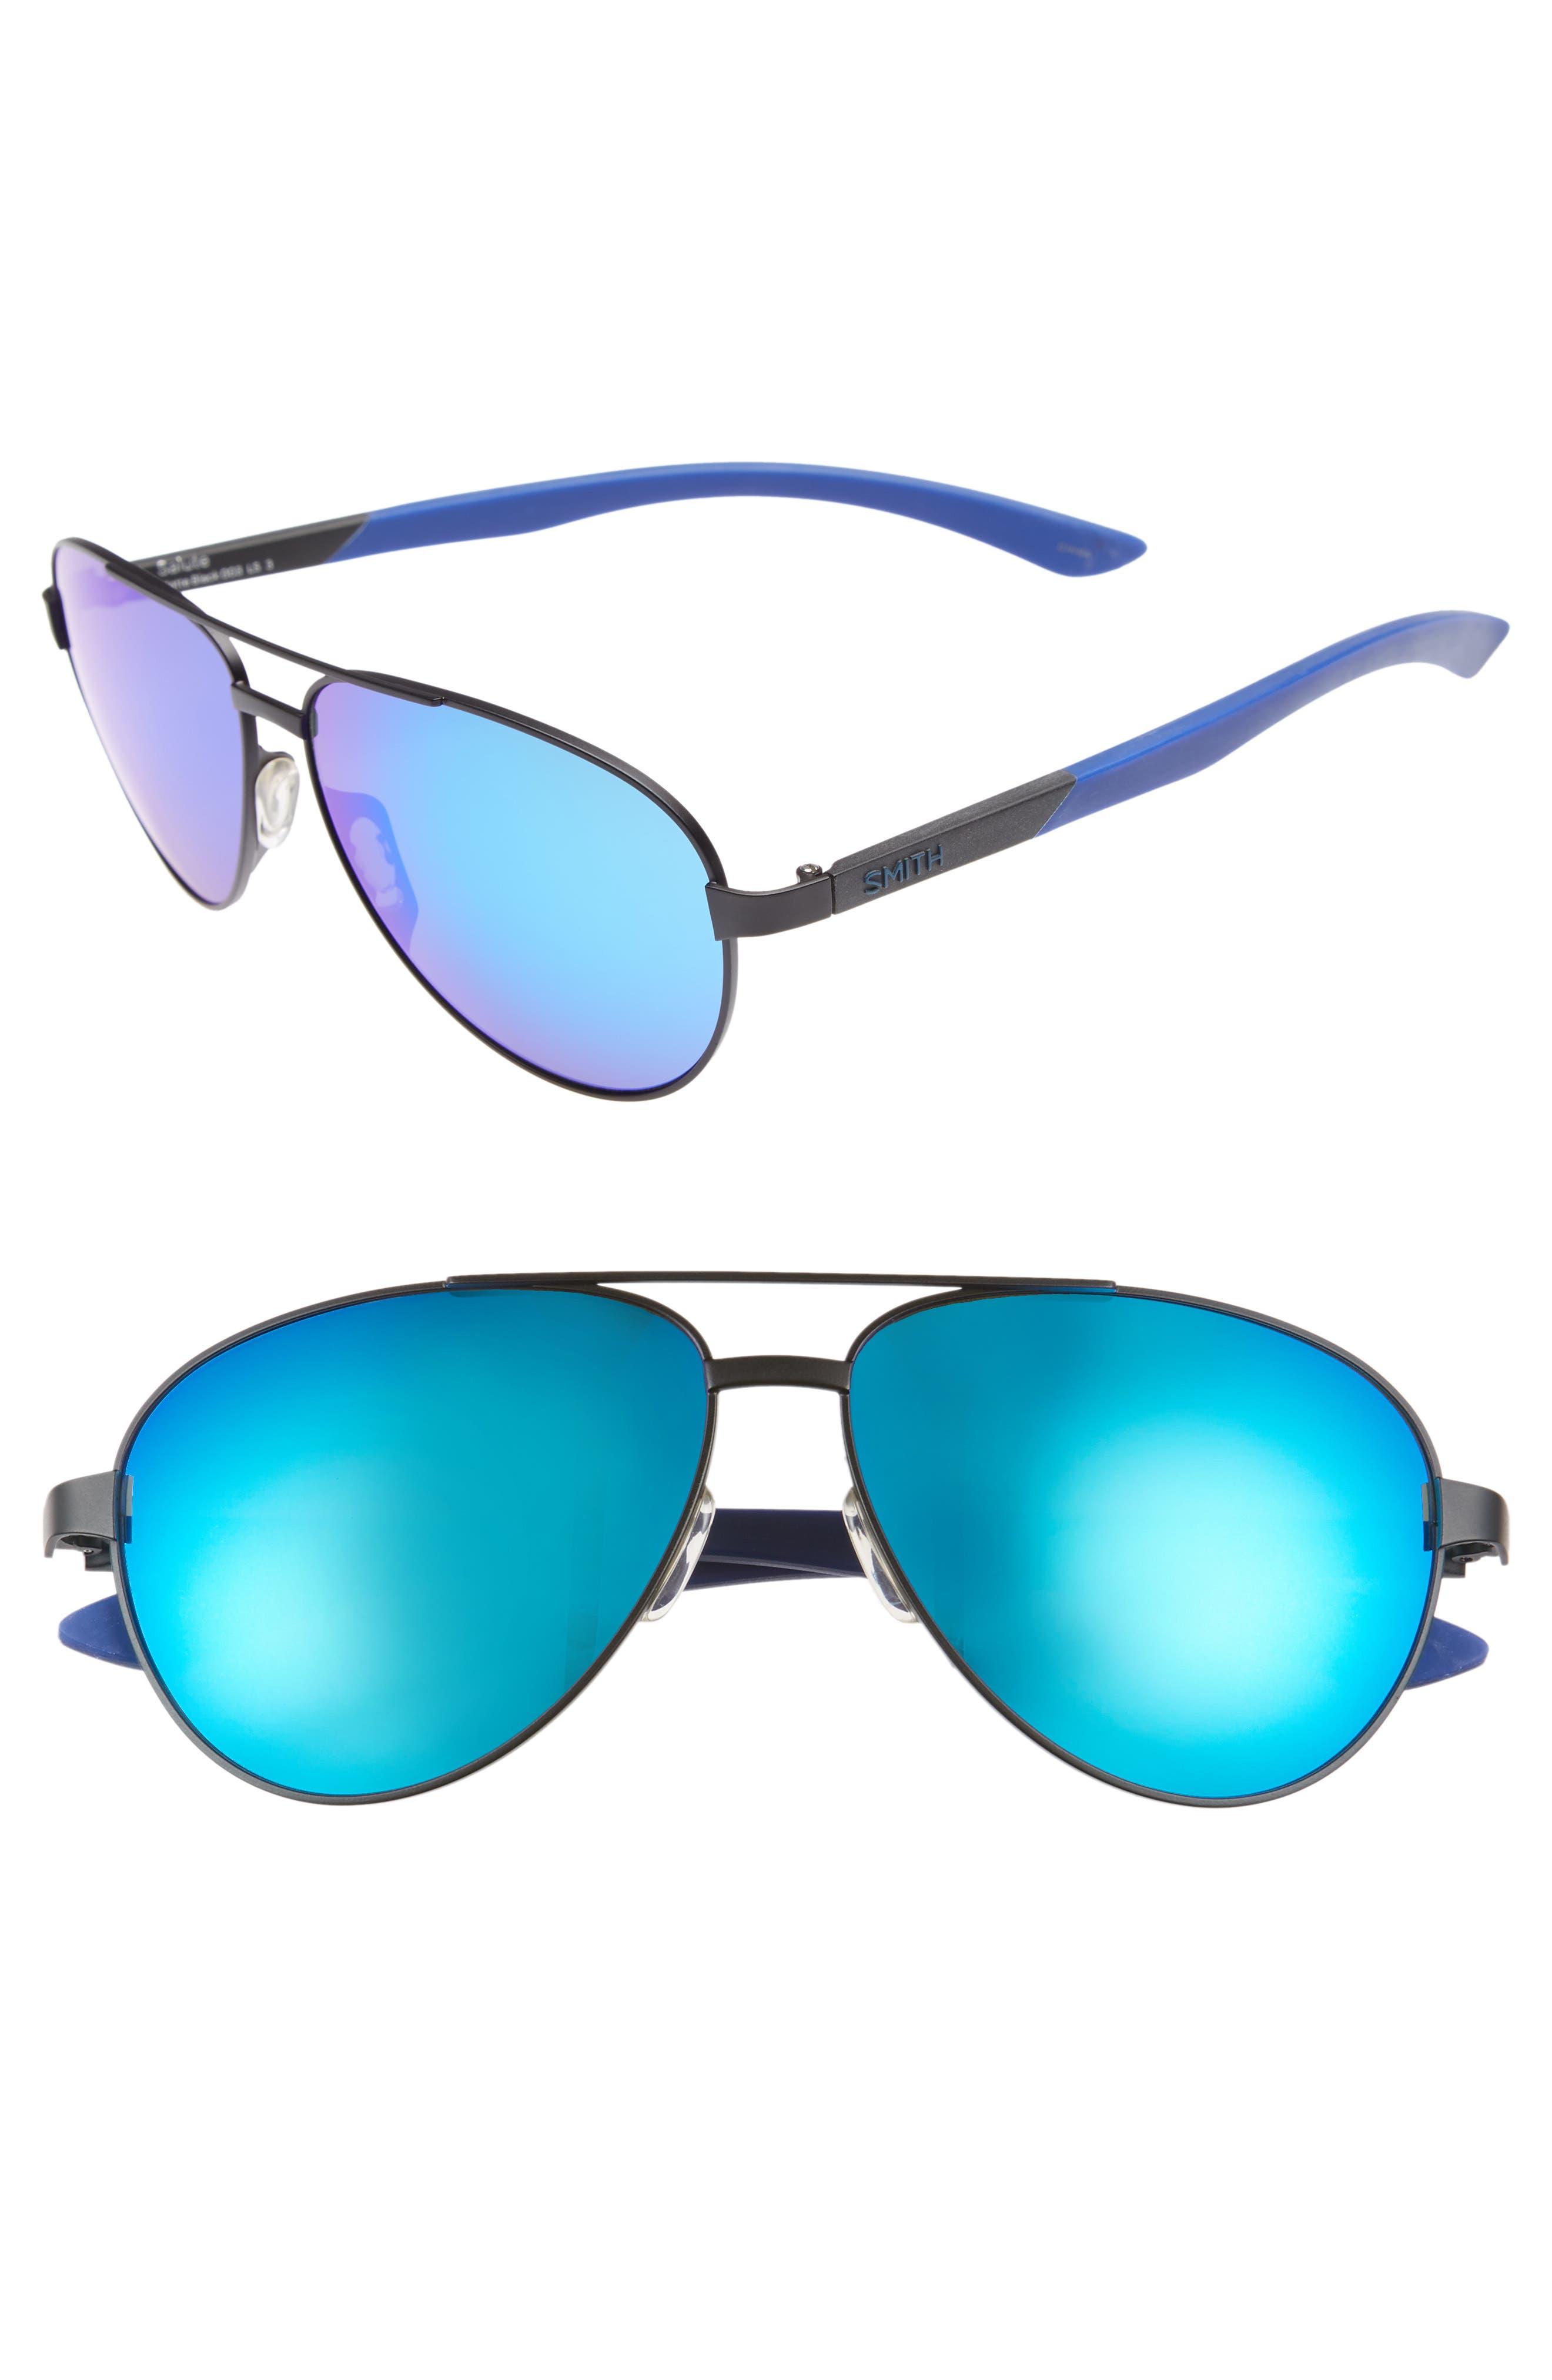 Smith Salute 59mm Aviator Sunglasses